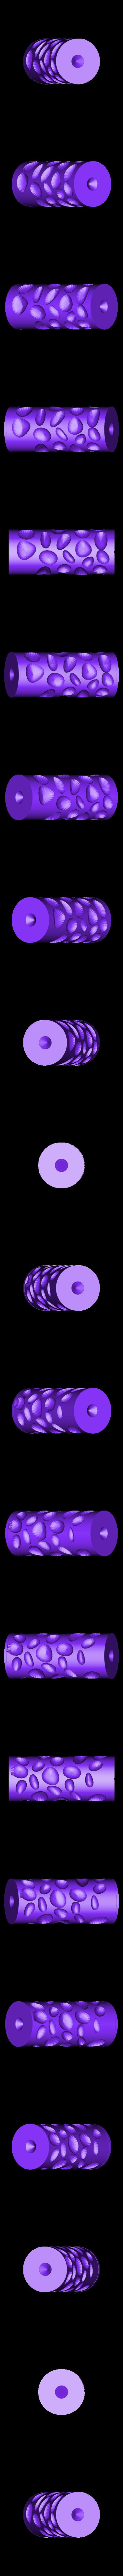 Pebble_Roller.STL Download free STL file Sand Pattern Rollers • 3D printing design, JonathanK1906